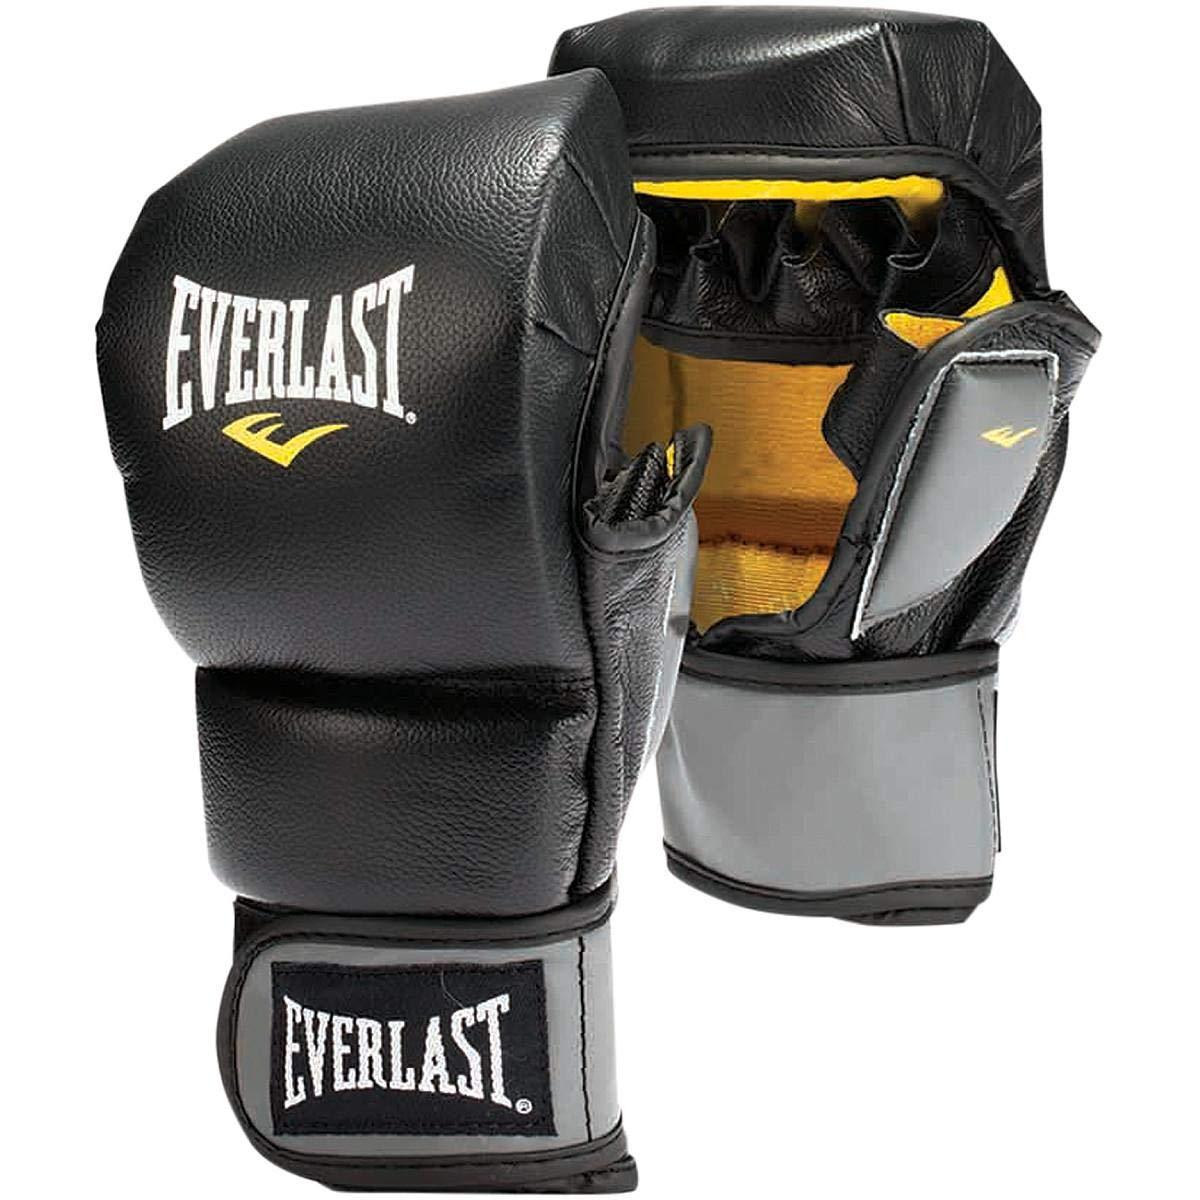 Everlast SAFEMAX HAMMERFIST トレーニンググローブ  M-L